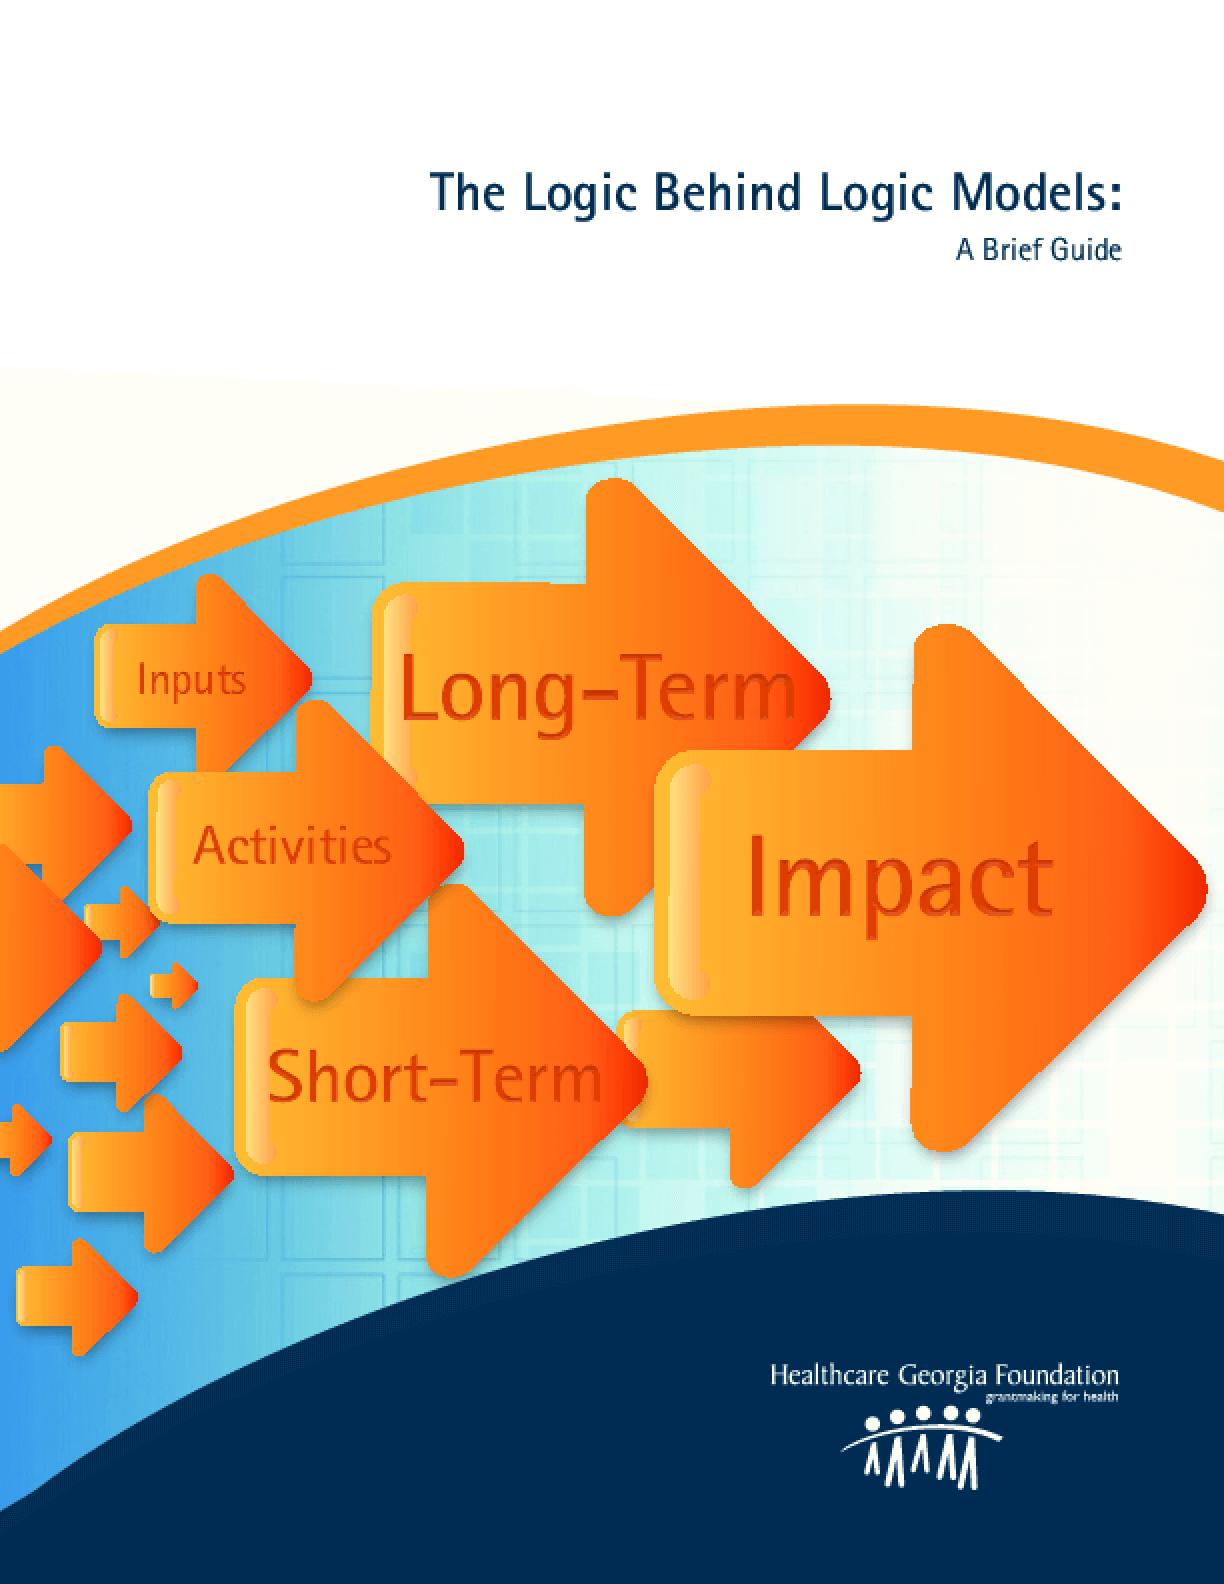 The Logic Behind Logic Models: A Brief Guide